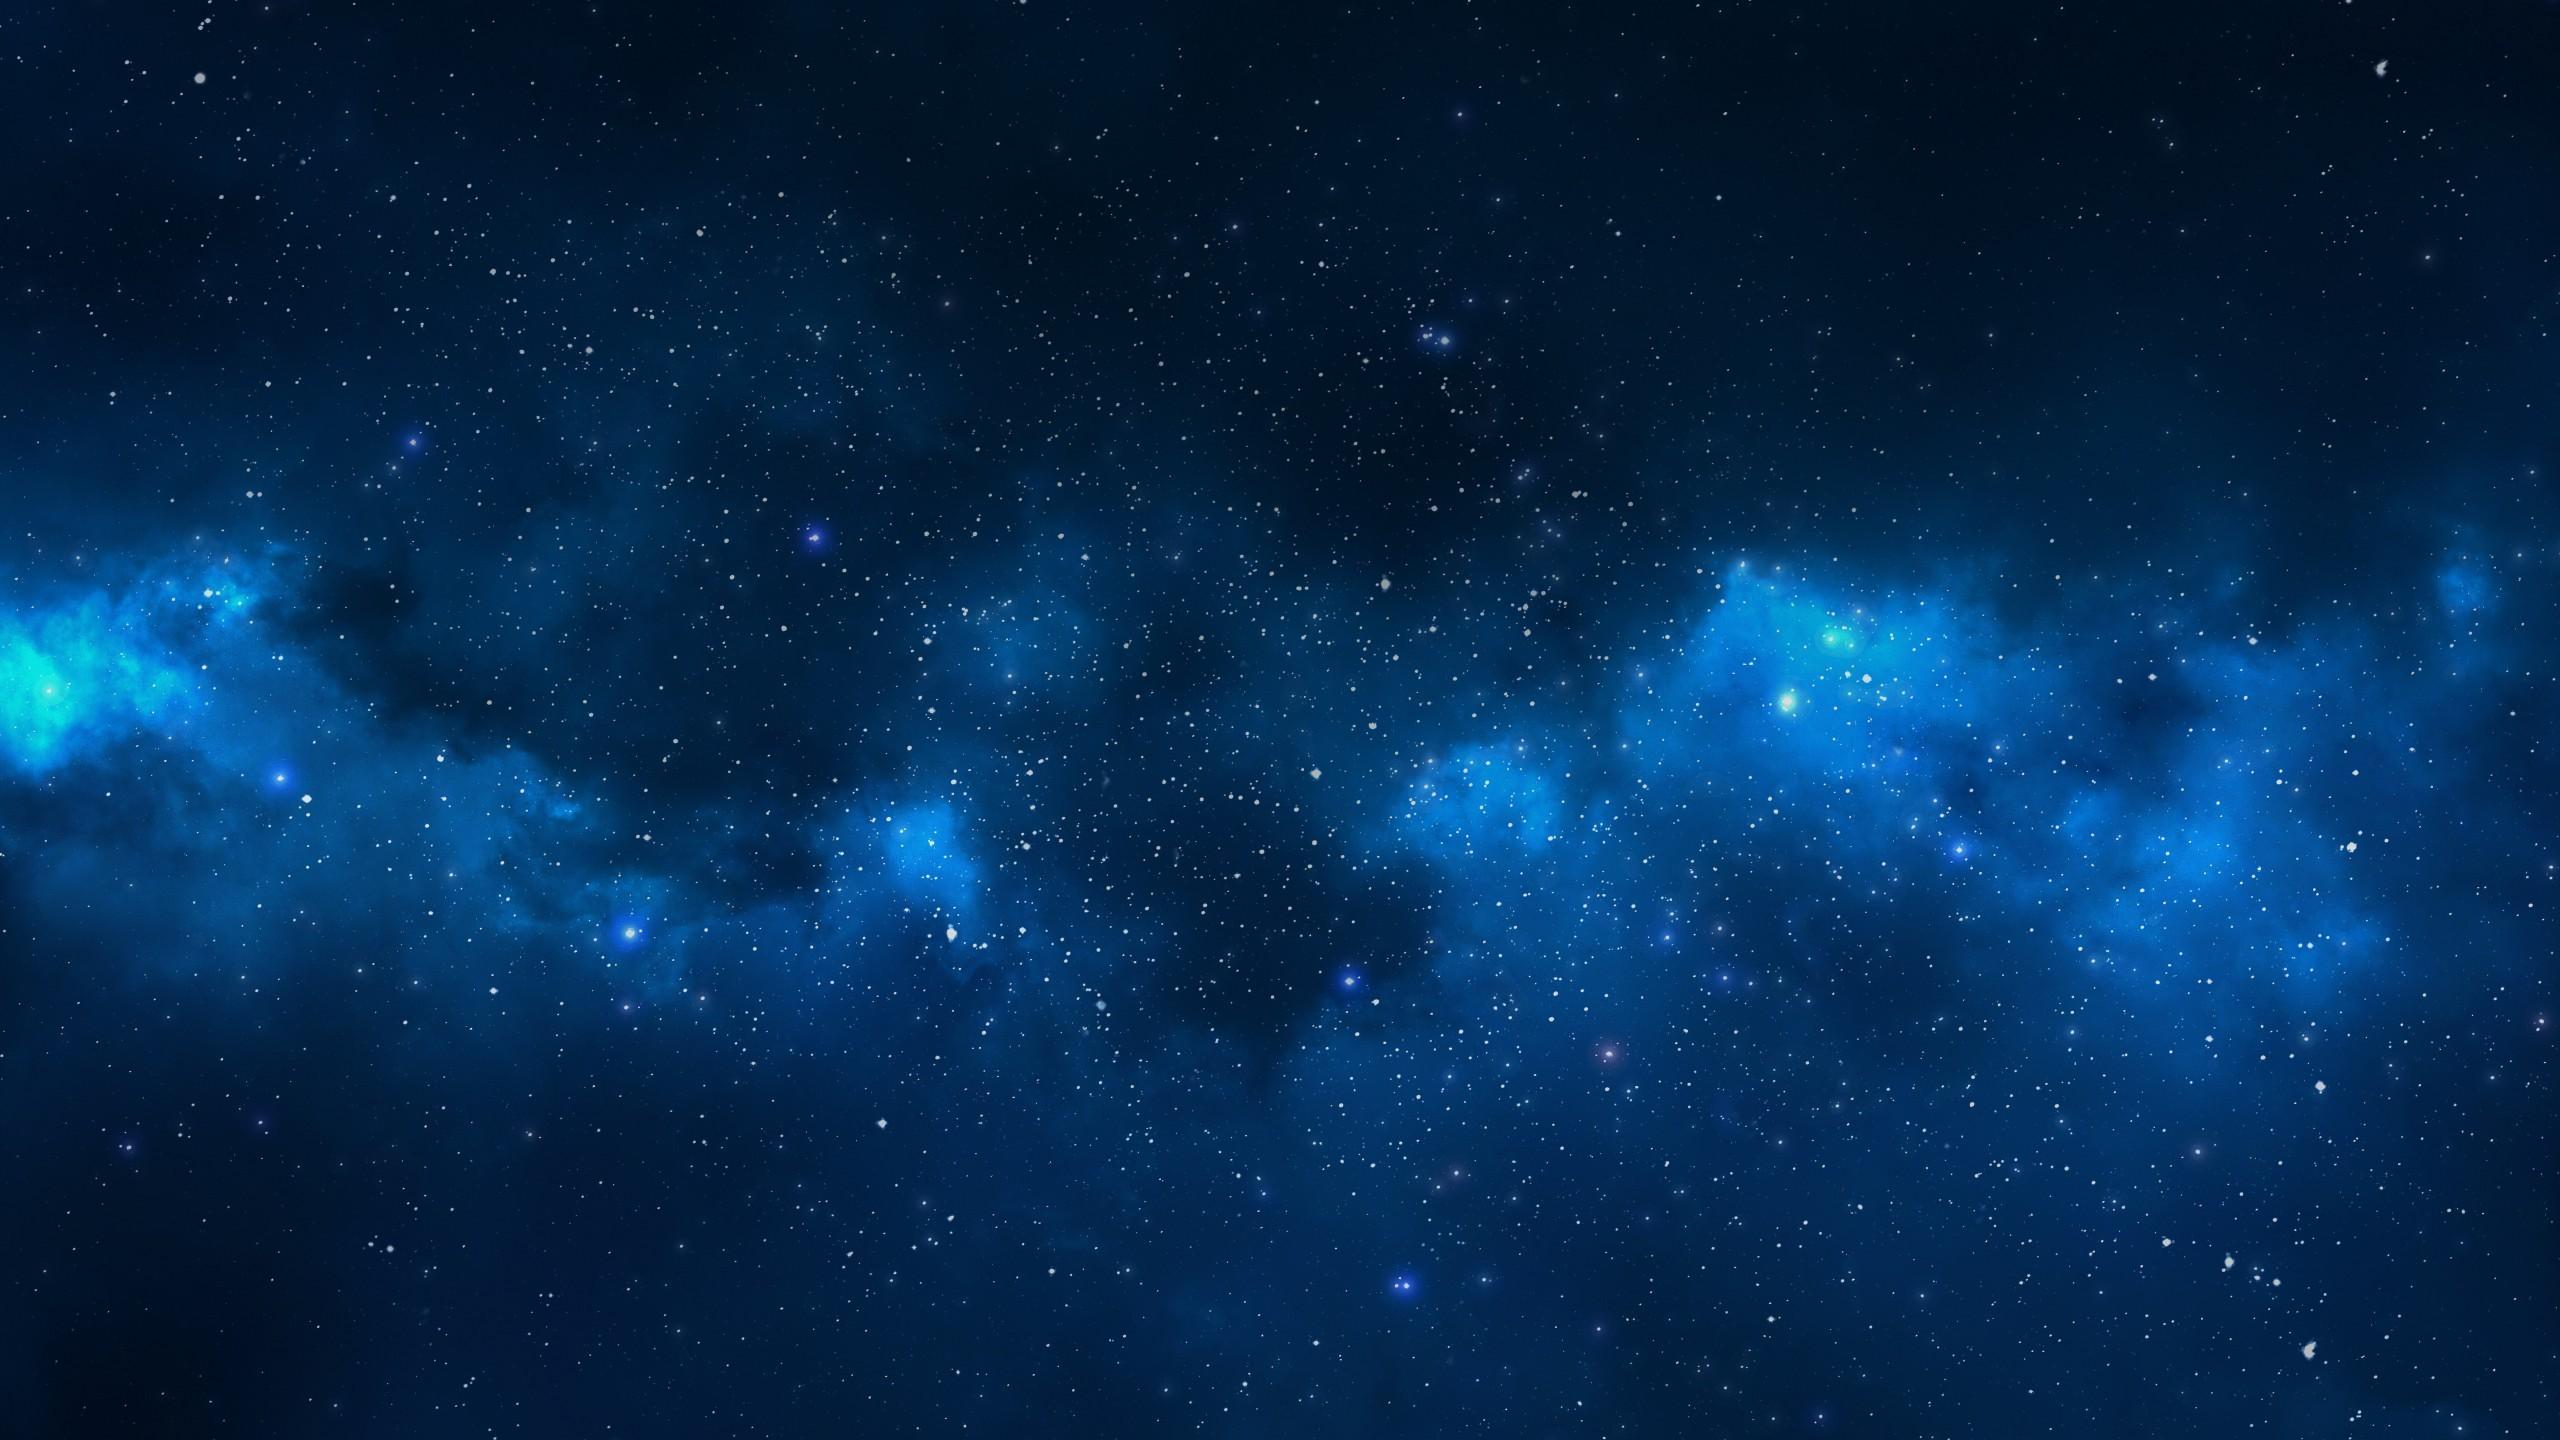 General 2560x1440 stars space digital art space art